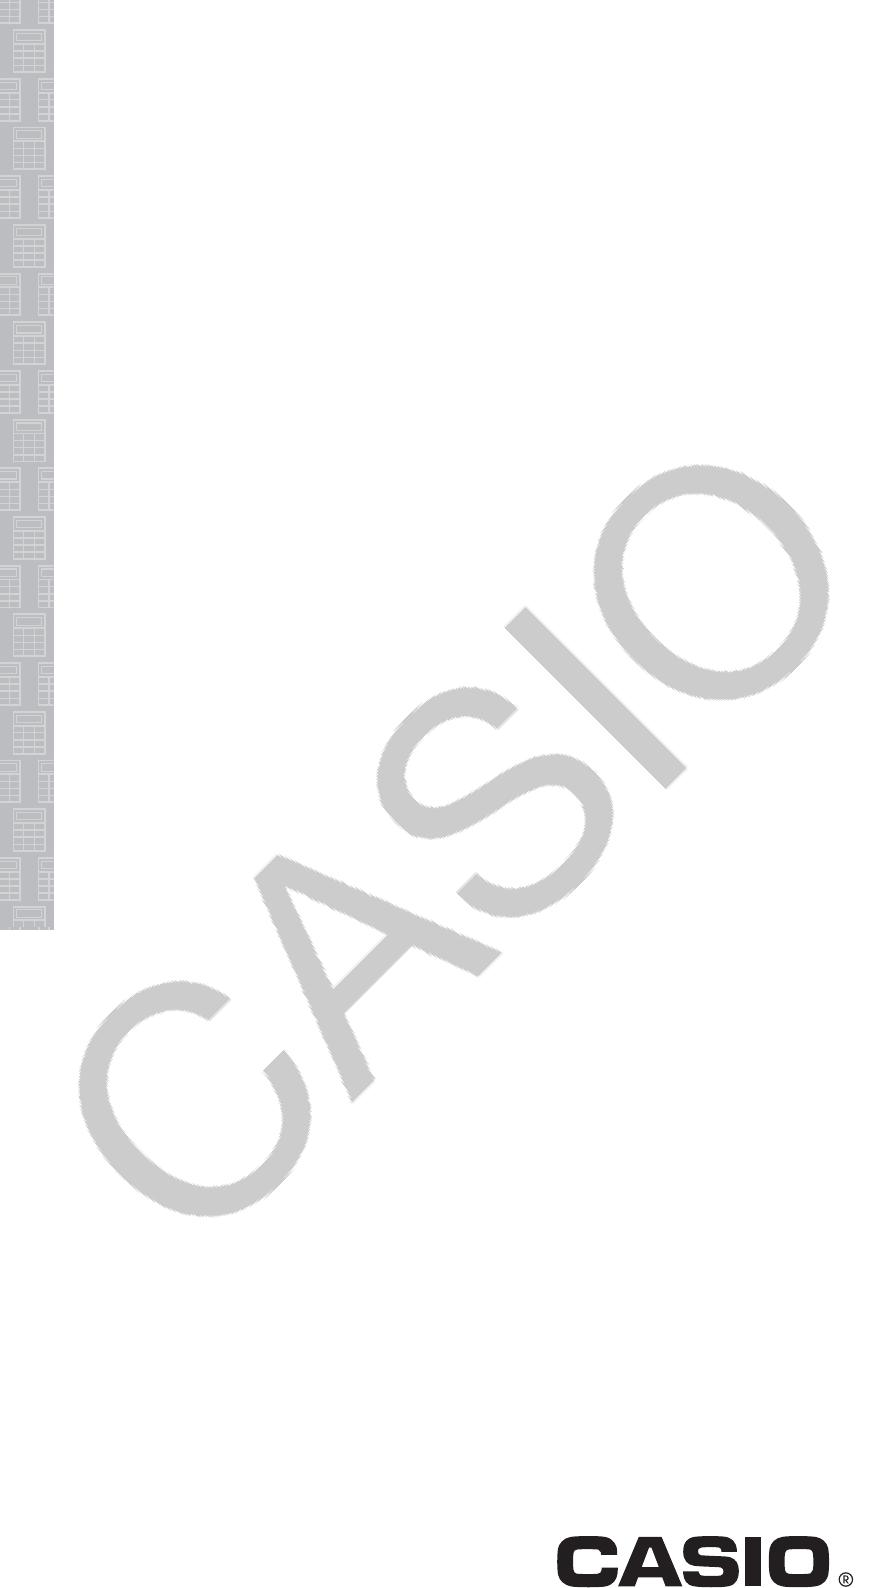 Priručnik Casio FX-991EX (46 stranica)